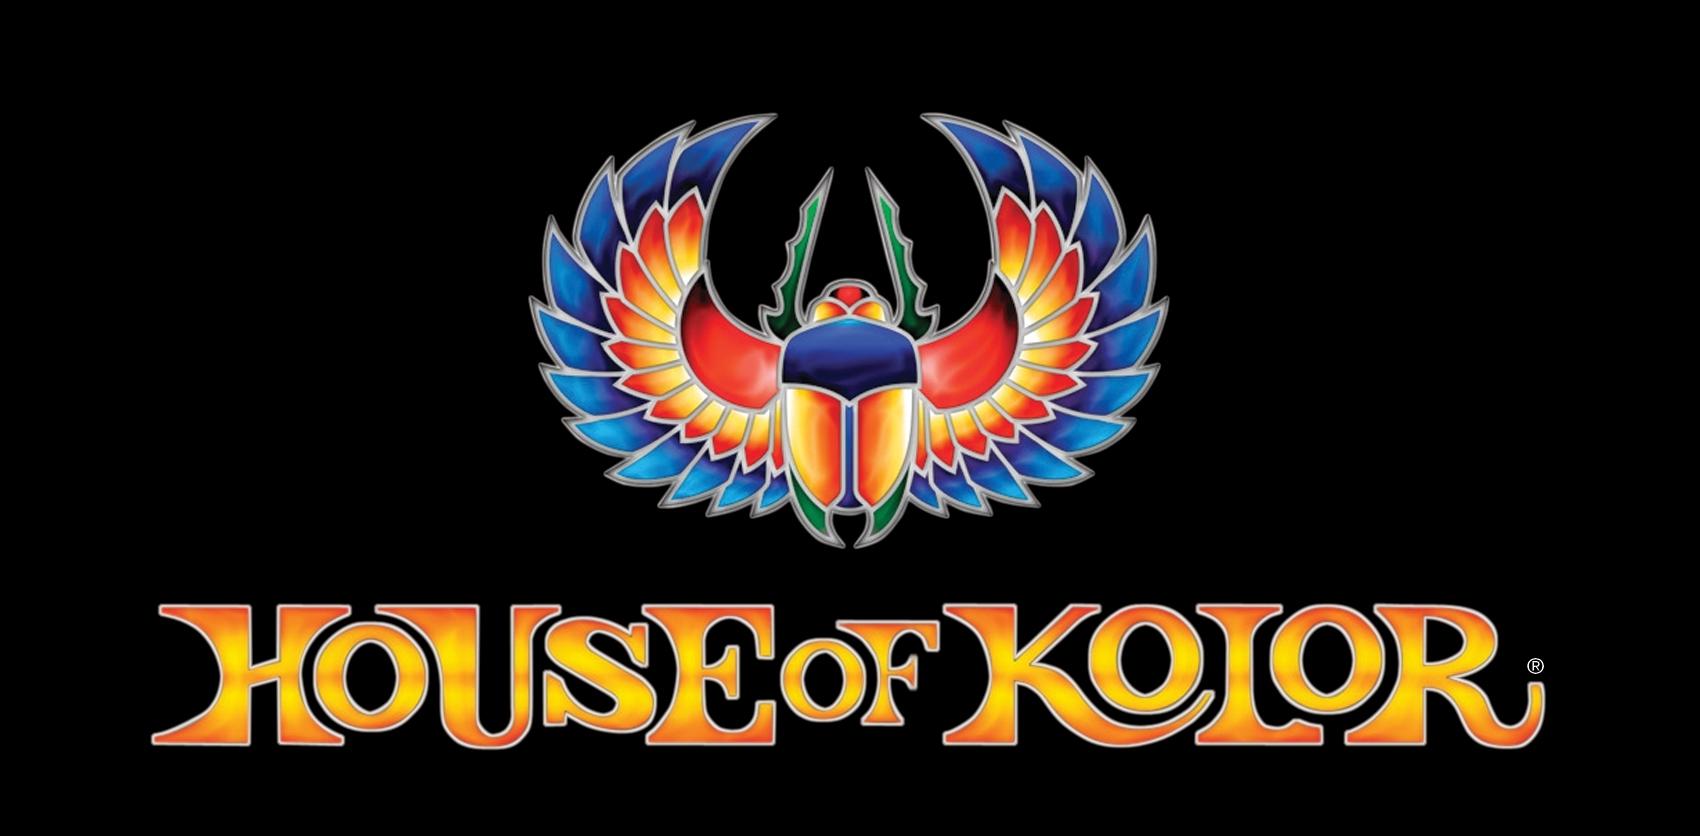 House of Kolor Jon Kosmoski